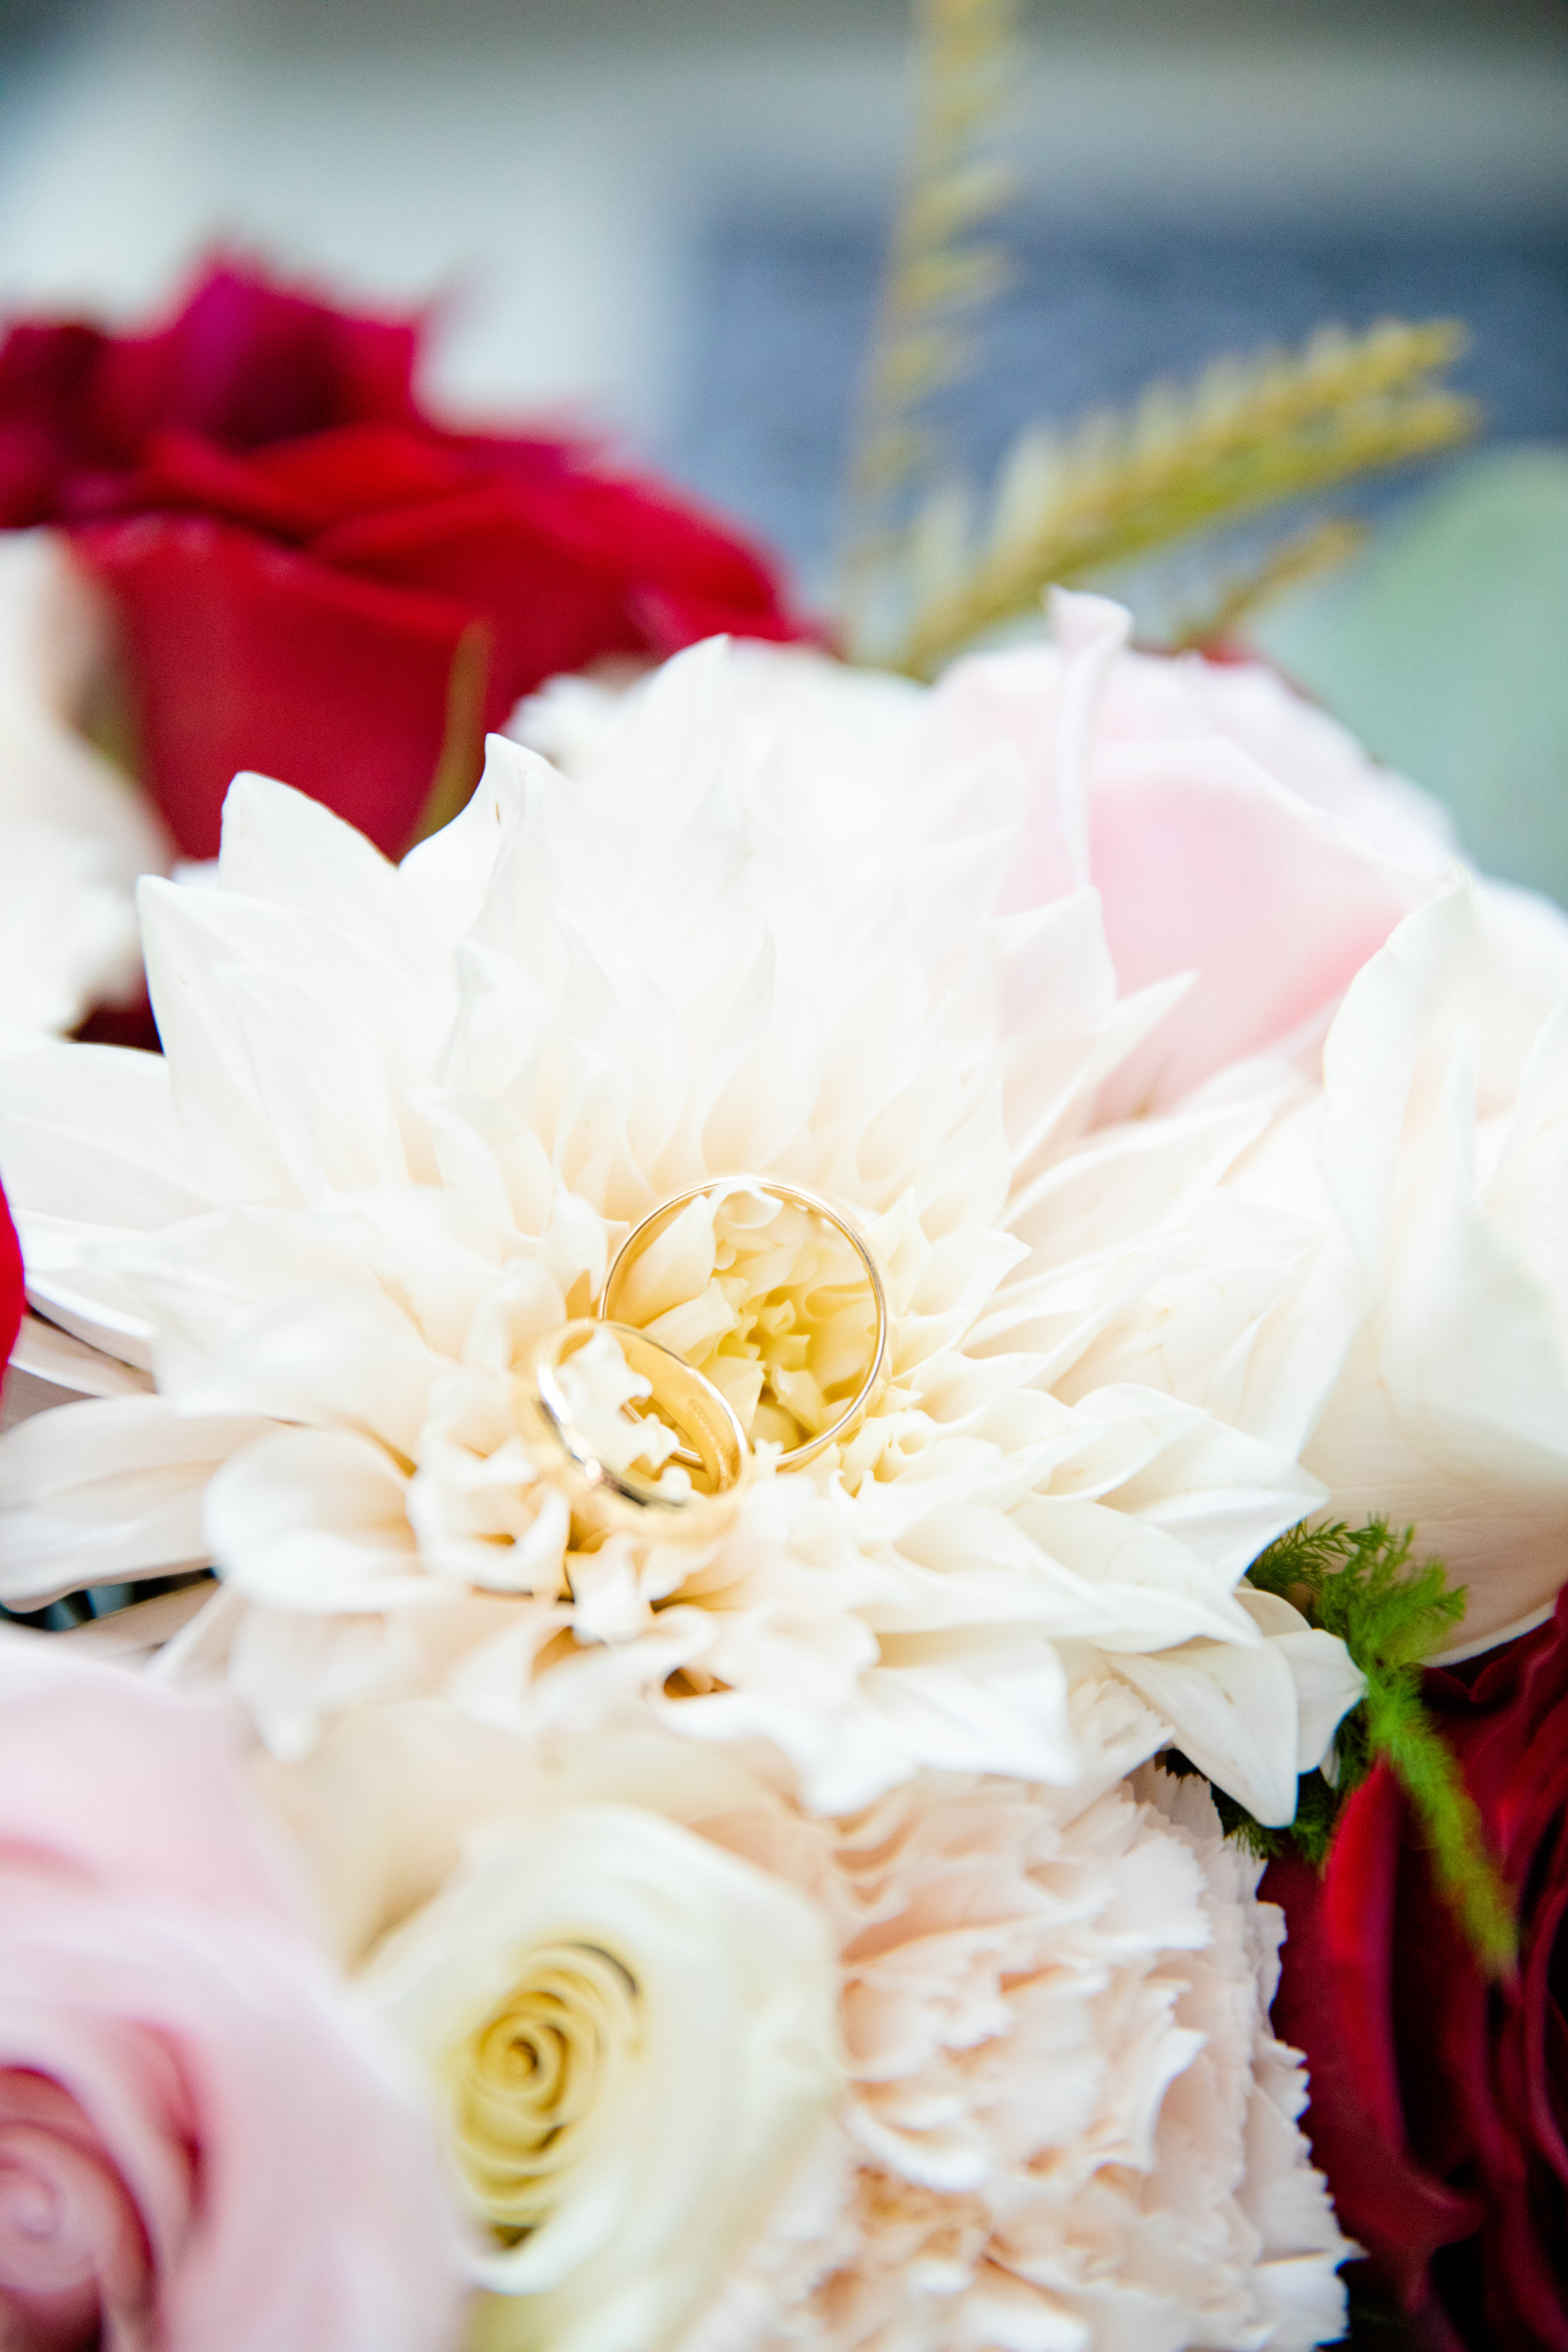 StefanieKamermanPhotography-MelanieandBenjamin-Wedding-Bethesda,MD-2019-10-12-71